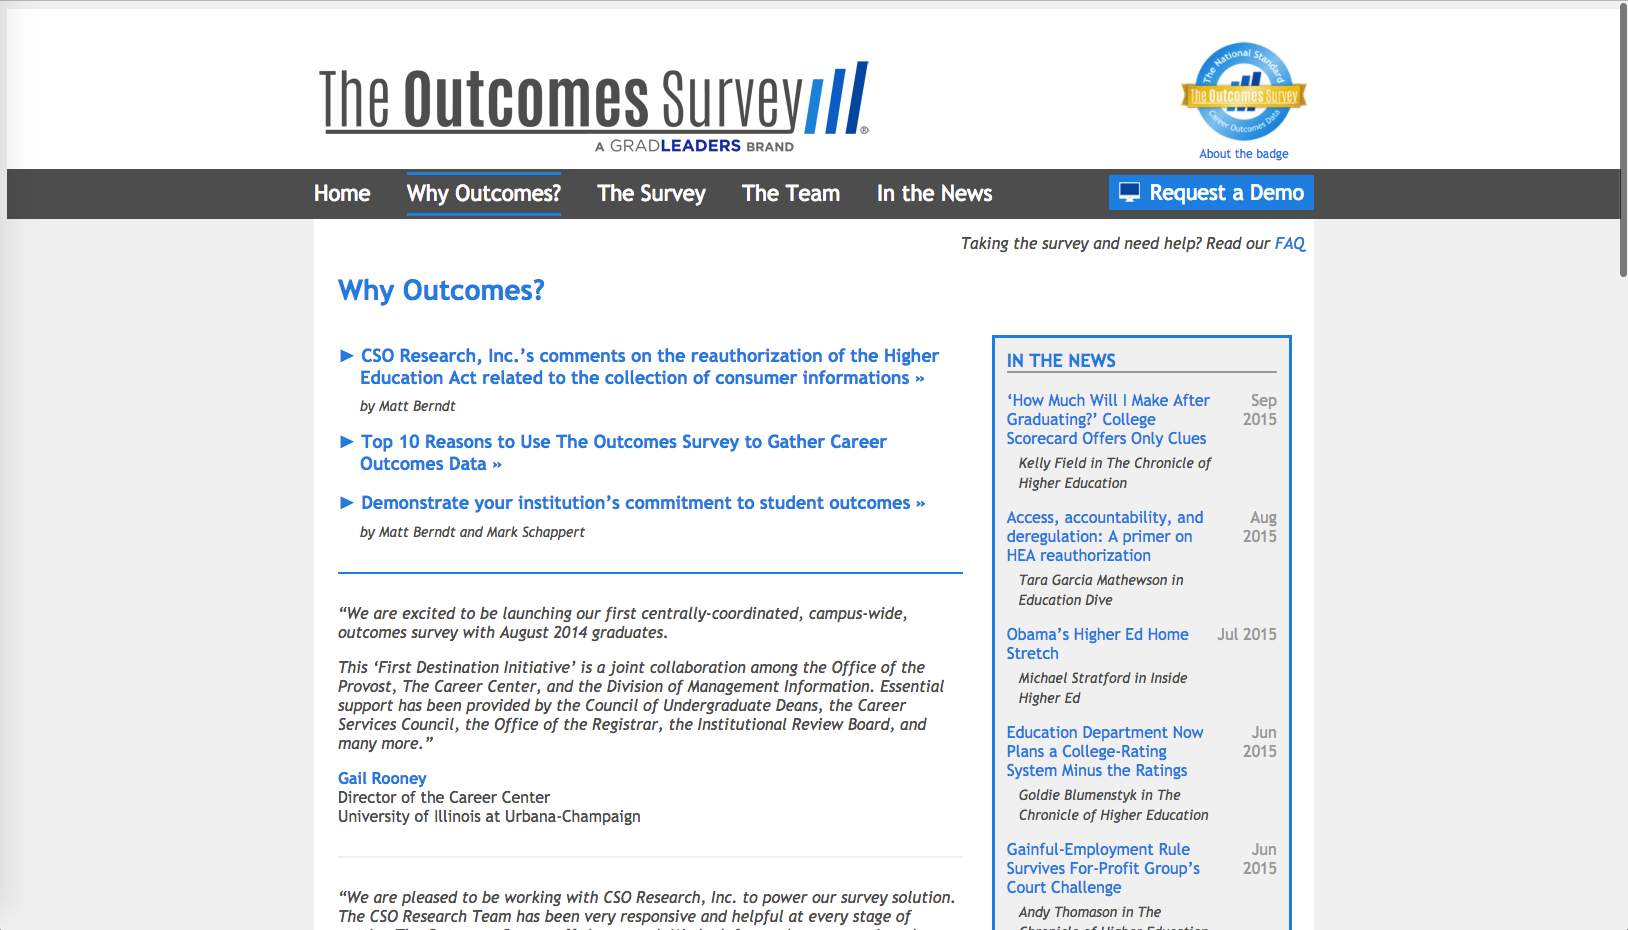 The Outcomes Survey Website